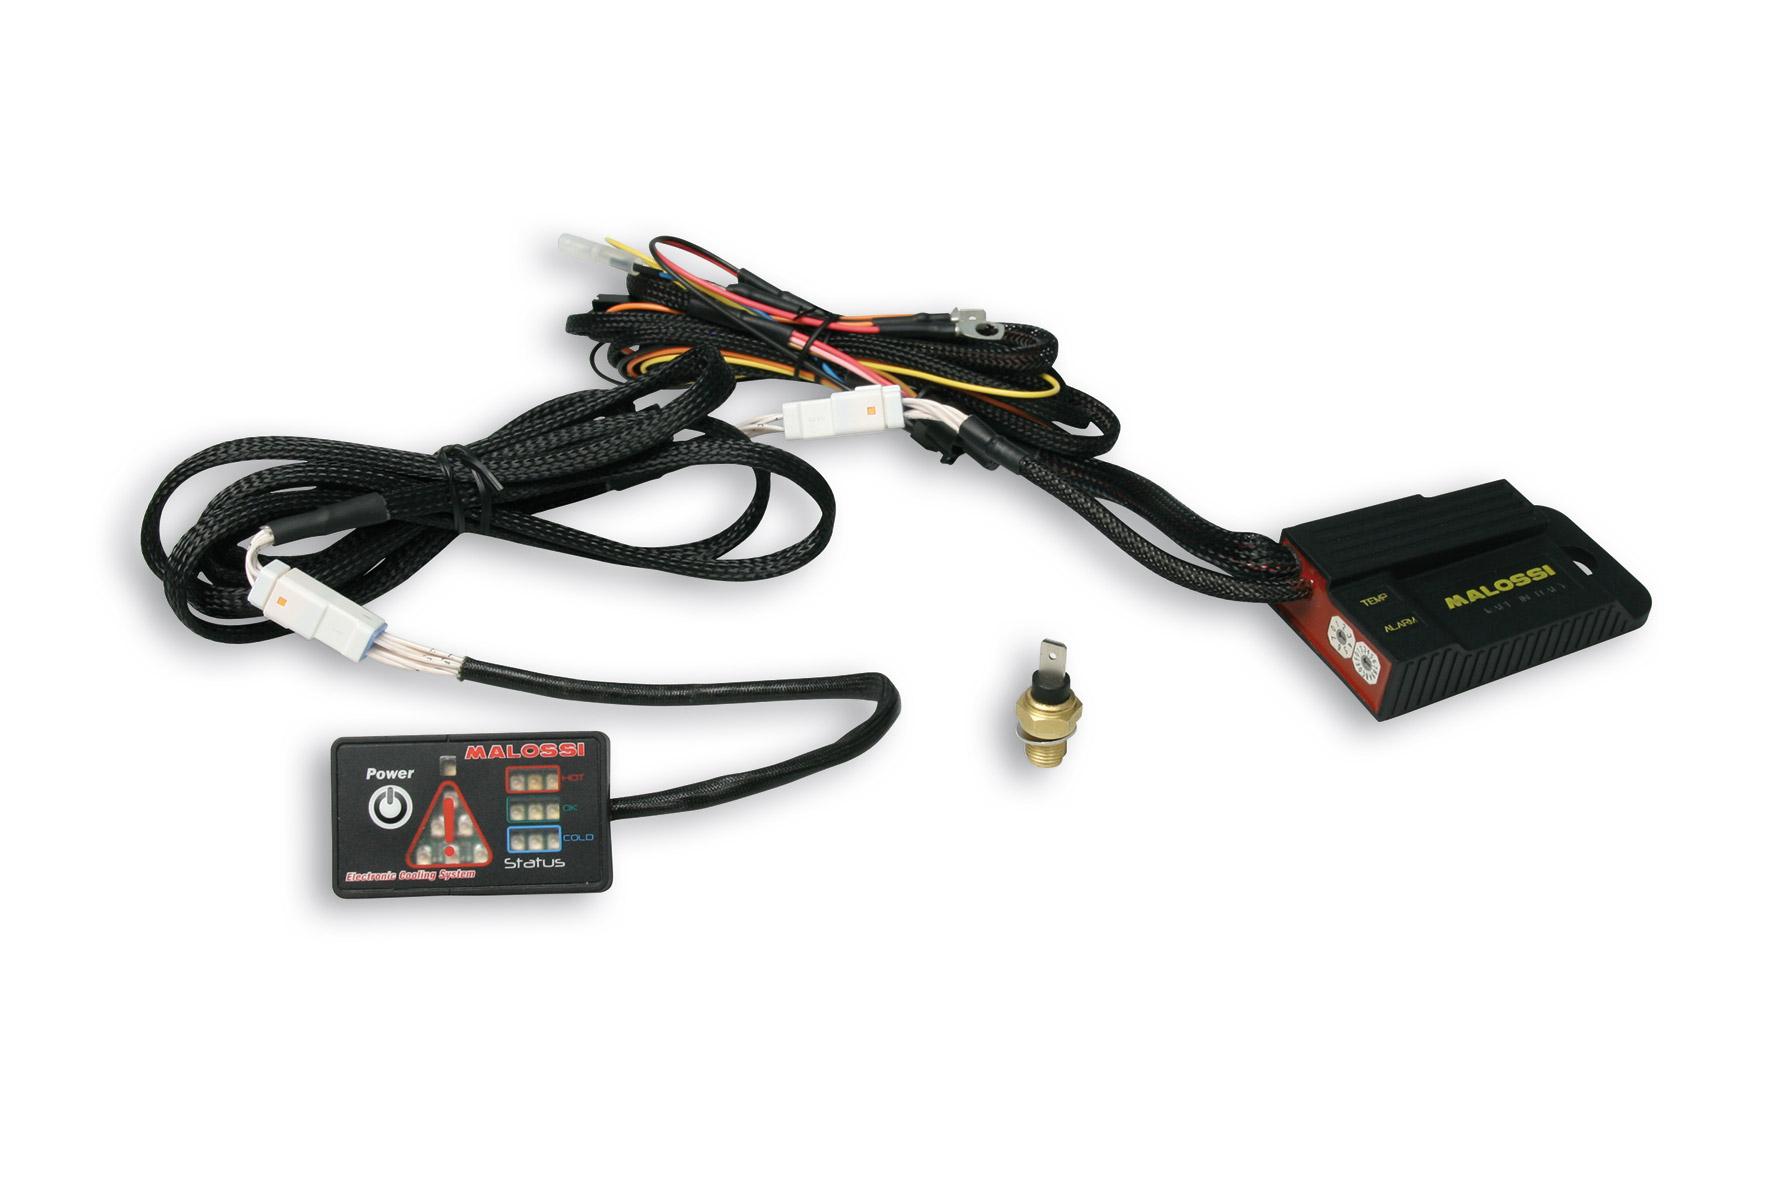 Regolatore di temperatura HEAT MASTER controller per ENERGY PUMP